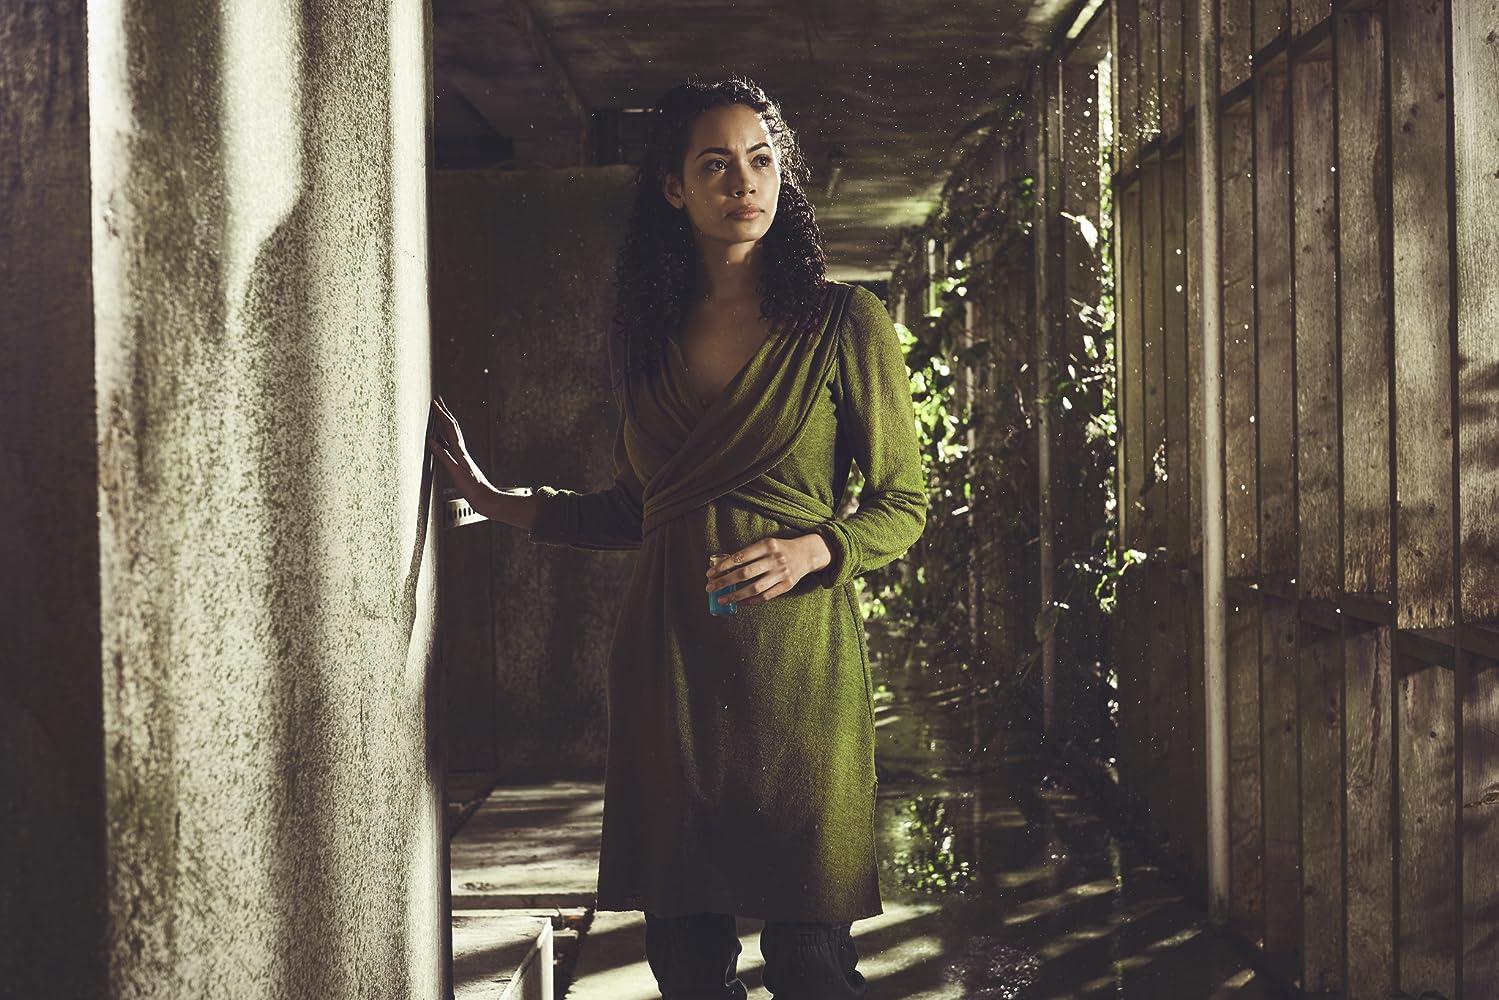 Madeleine Mantock in Into the Badlands (2015)